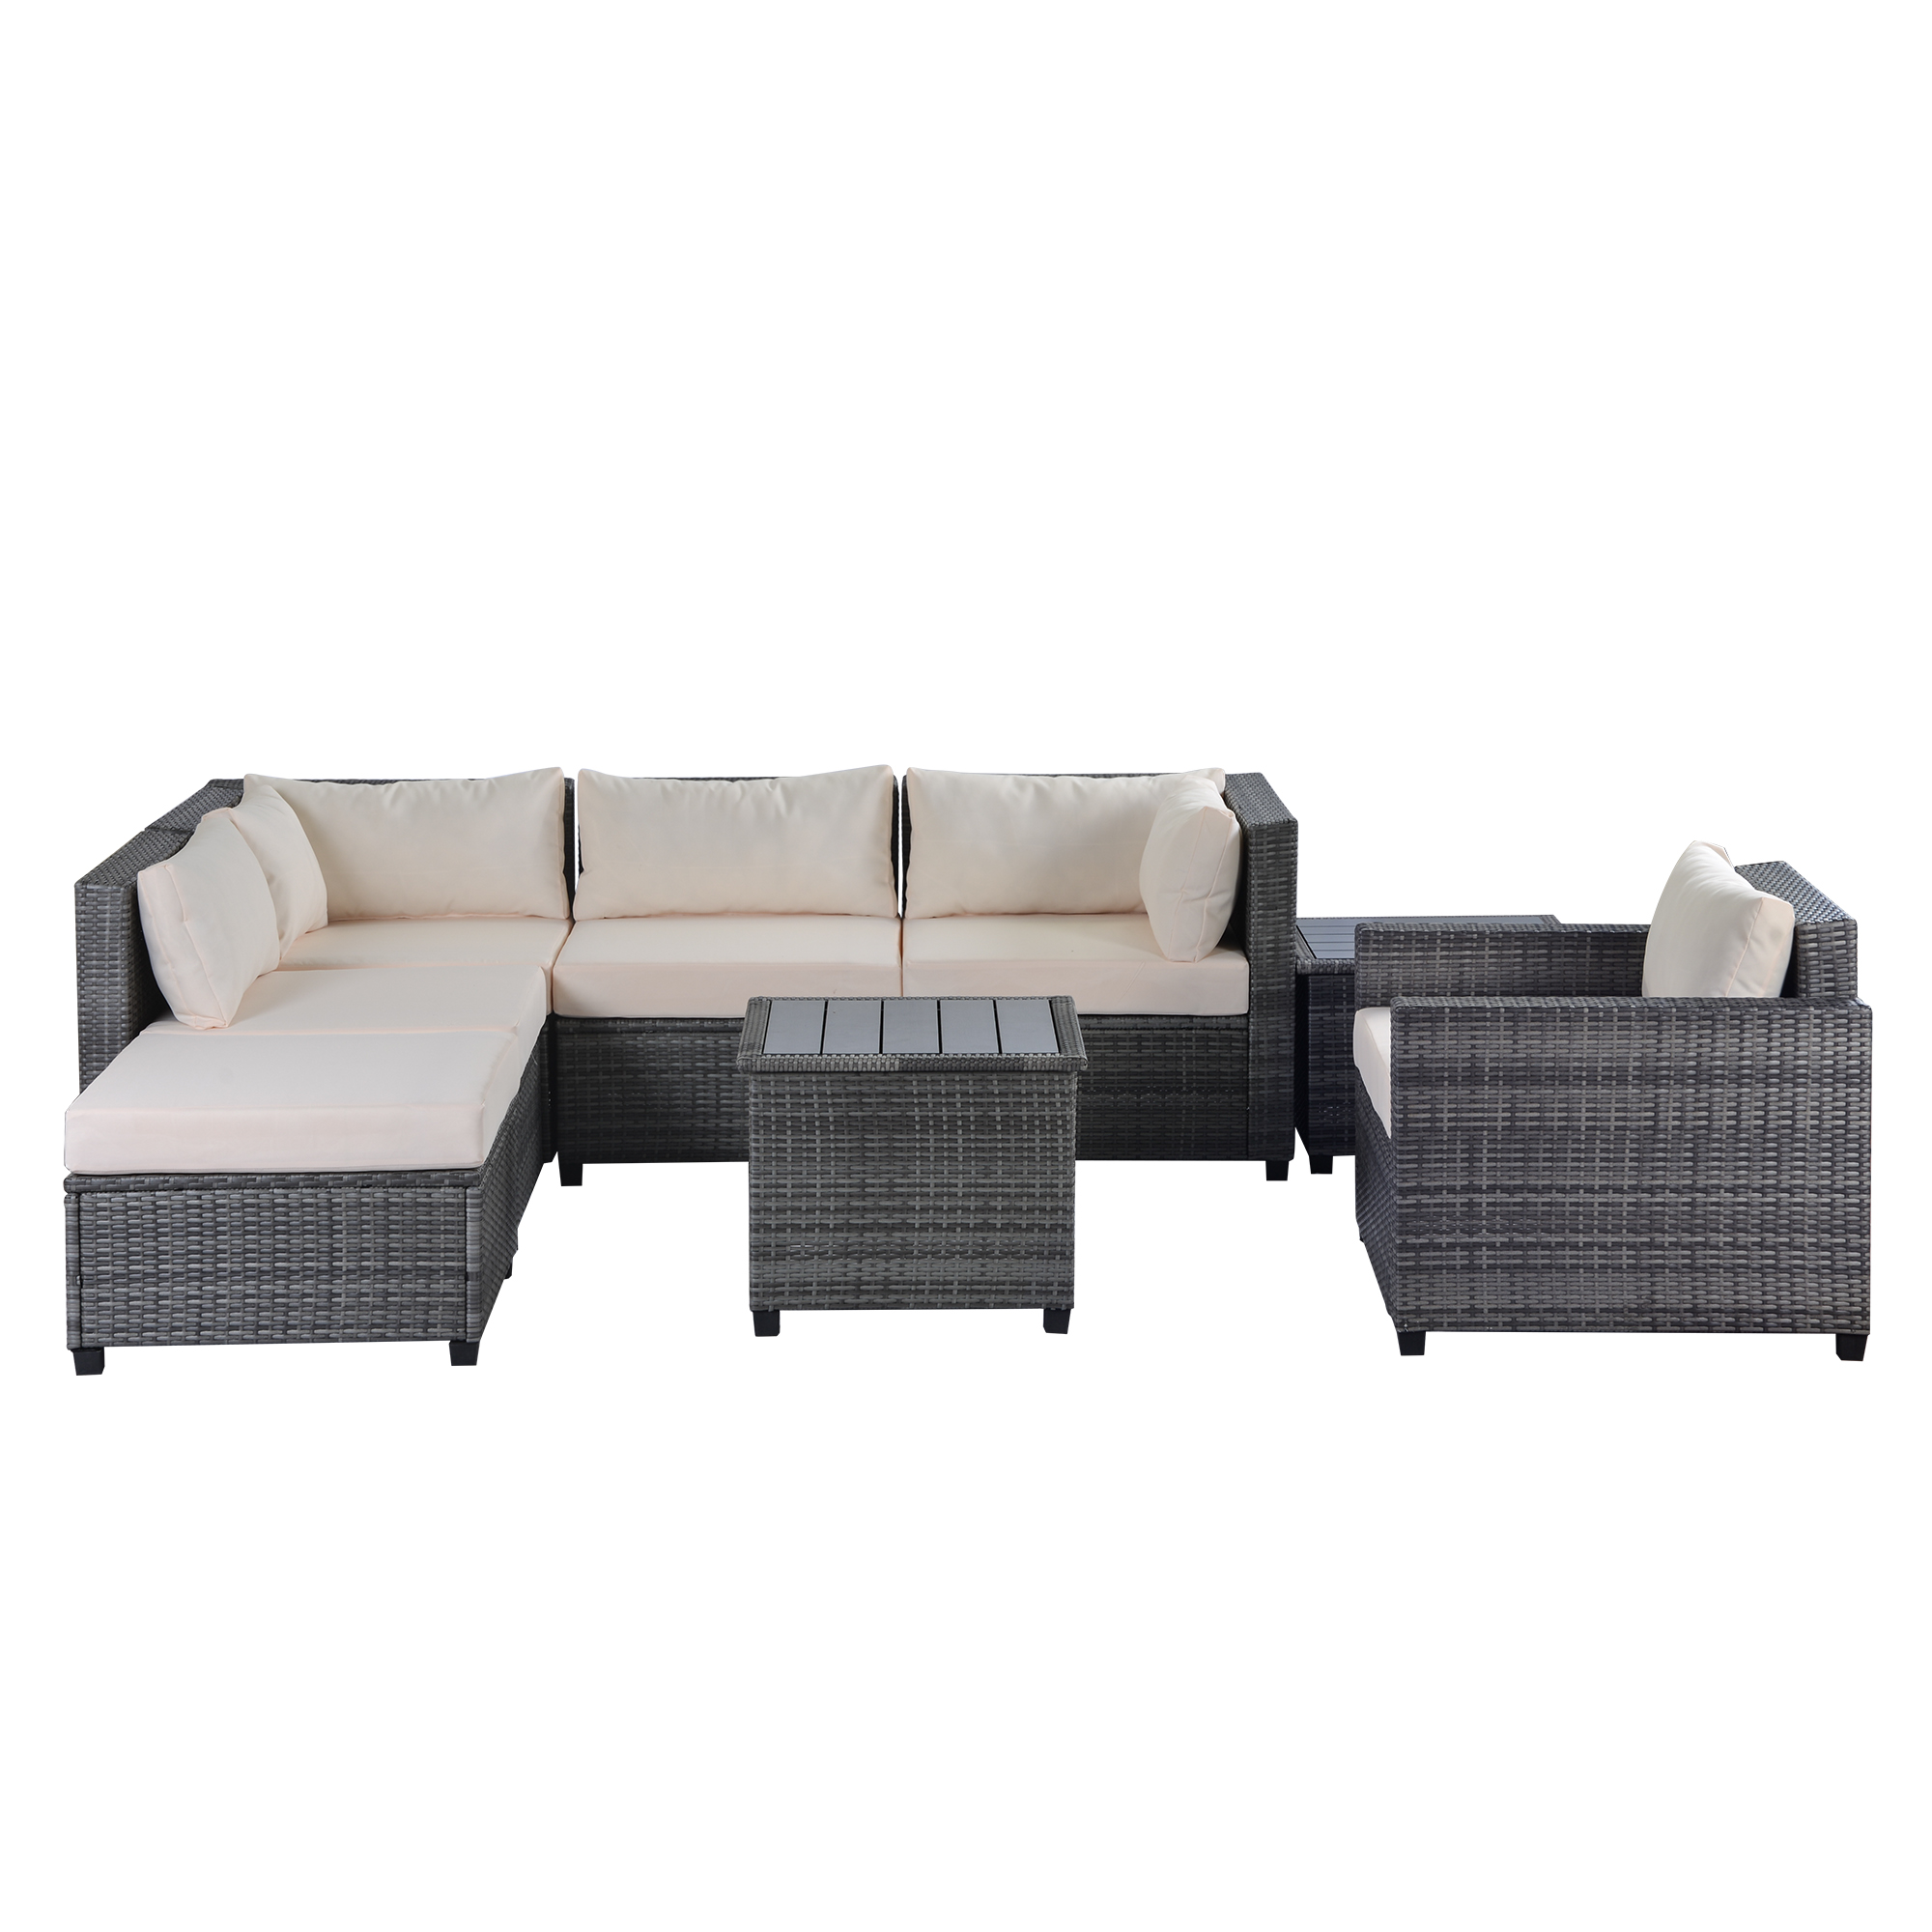 Outdoor Graden Patio Conversation Furniture Sets, 8-Piece ...